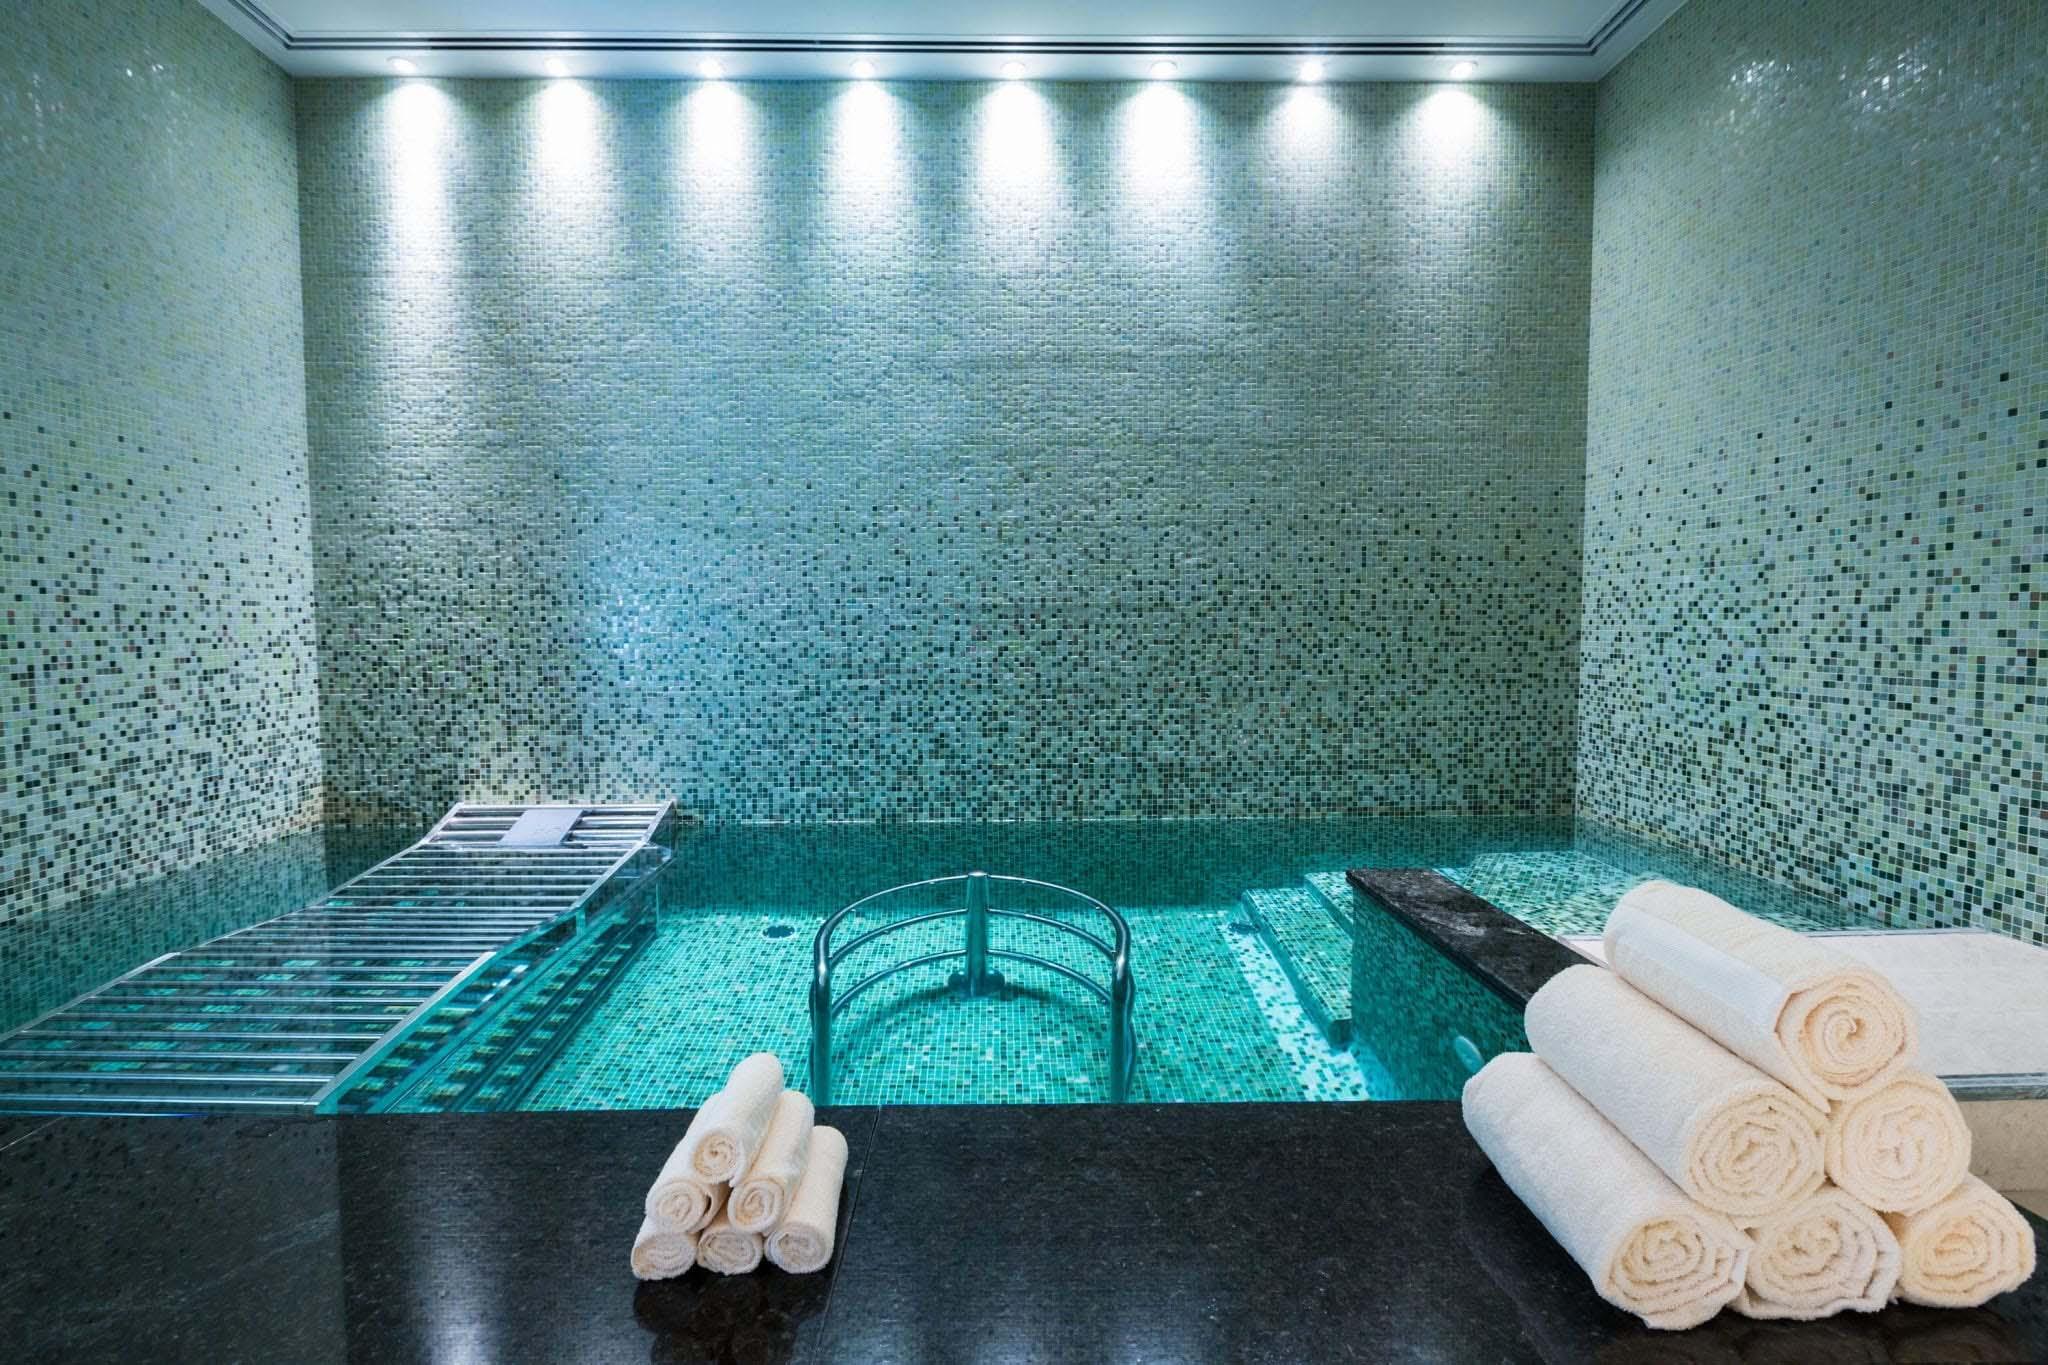 Shading Blends - Four Seasons Hotel, Abu Dhabi, UAE Slider